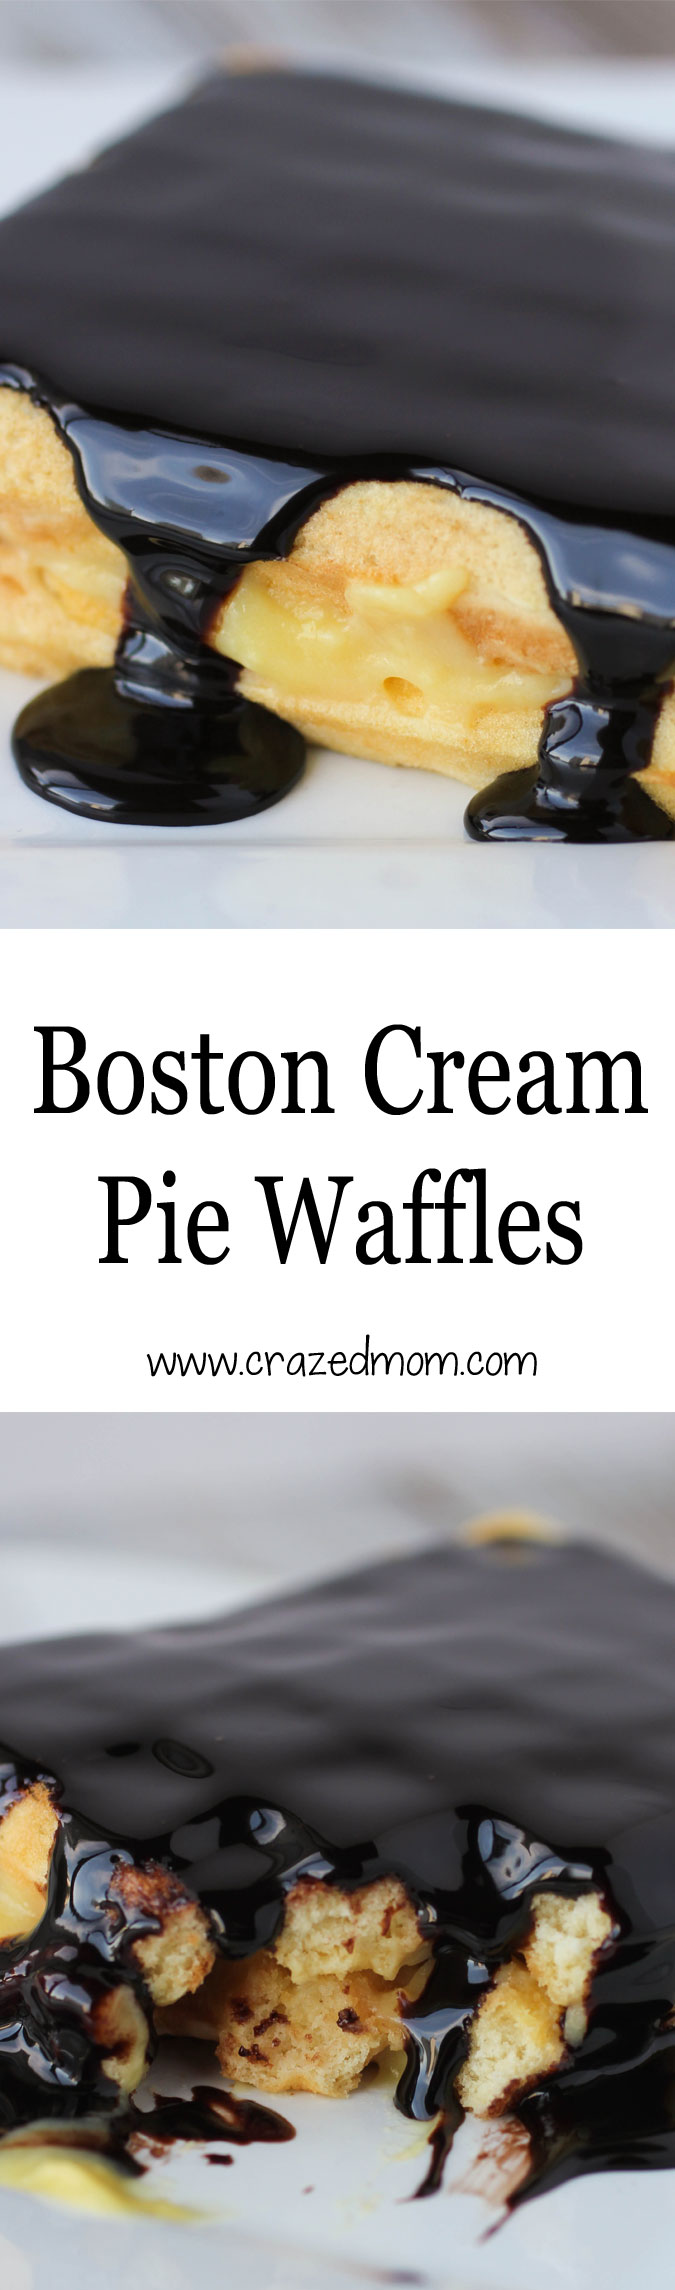 Boston Cream Pie Waffles